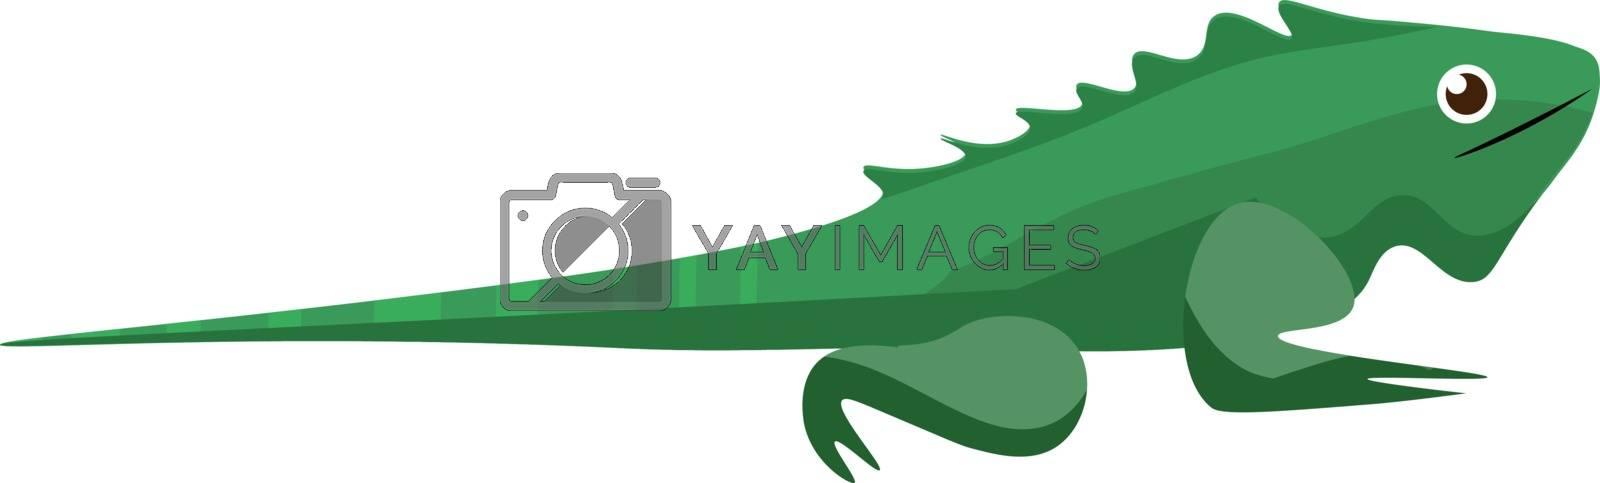 Royalty free image of A crawling green iguana/ Iguana iguana/wild reptile vector or co by Morphart